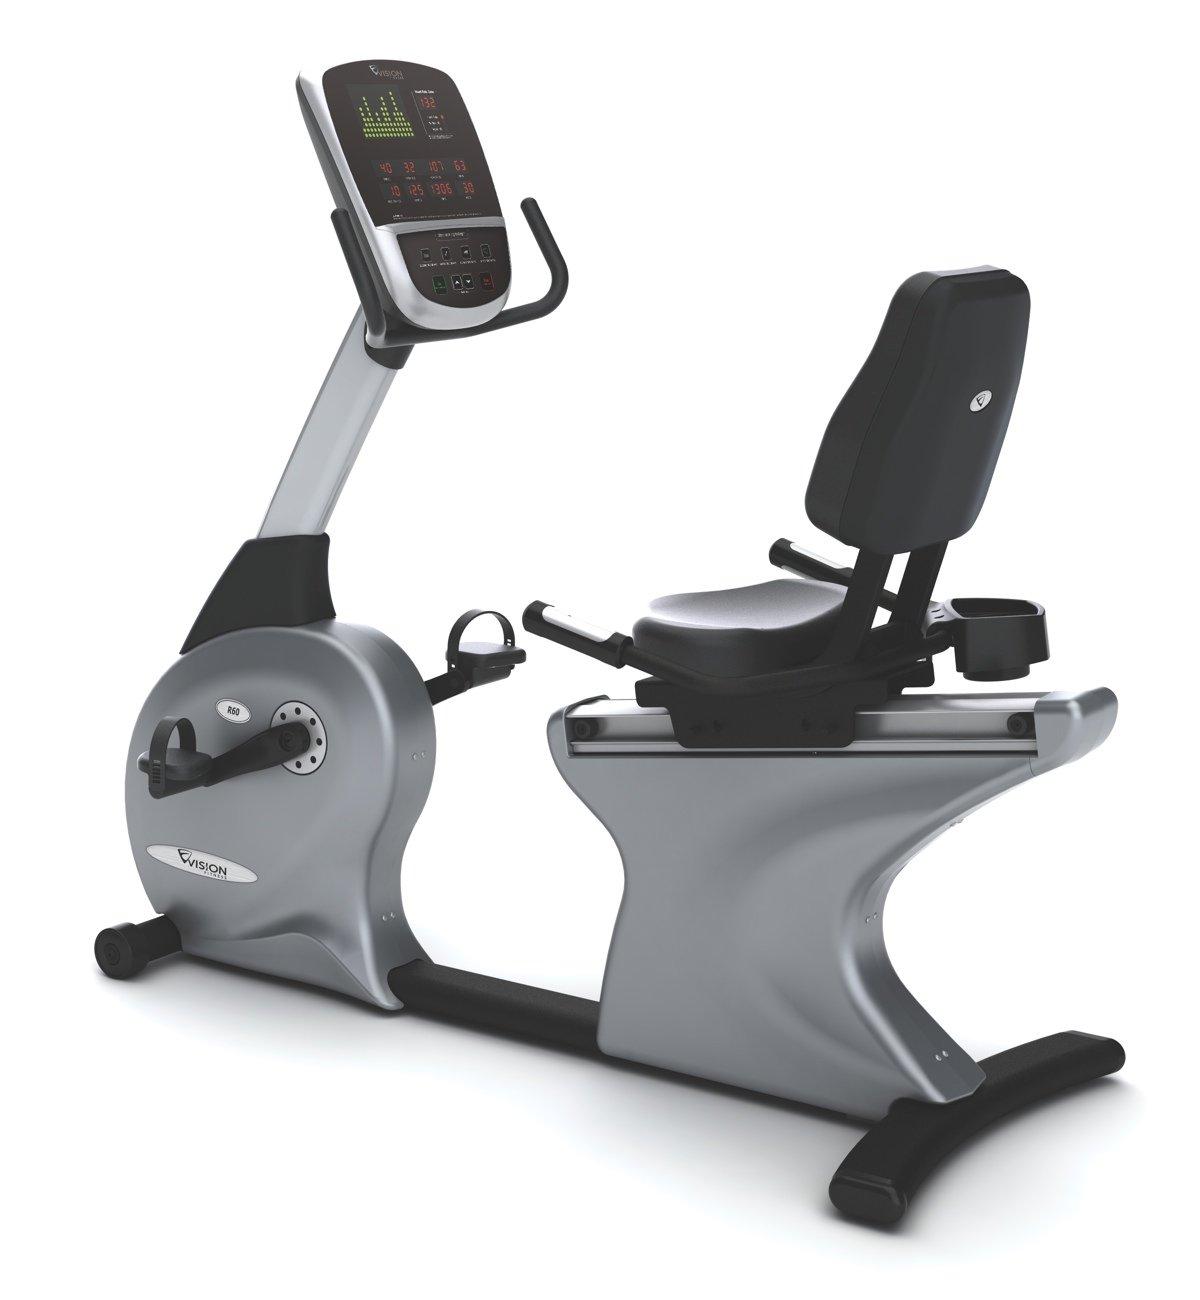 Vision R60 Fitness R60 Vision Halbliegeergometer - Recumbent Ergometer 2cb6af